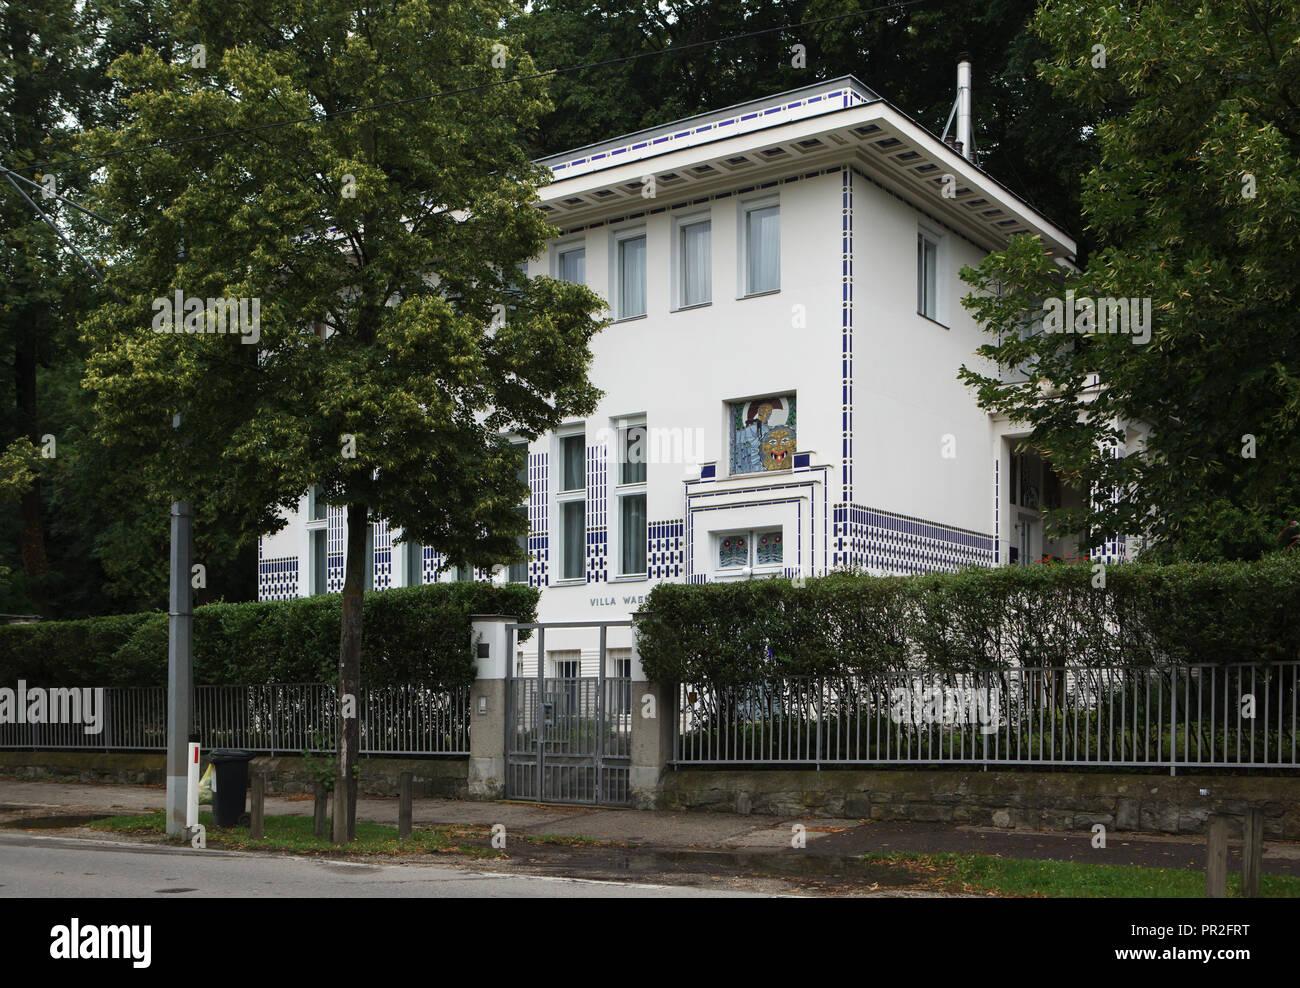 Wagner Villa Ii Designed By Austrian Modernist Architect Otto Wagner